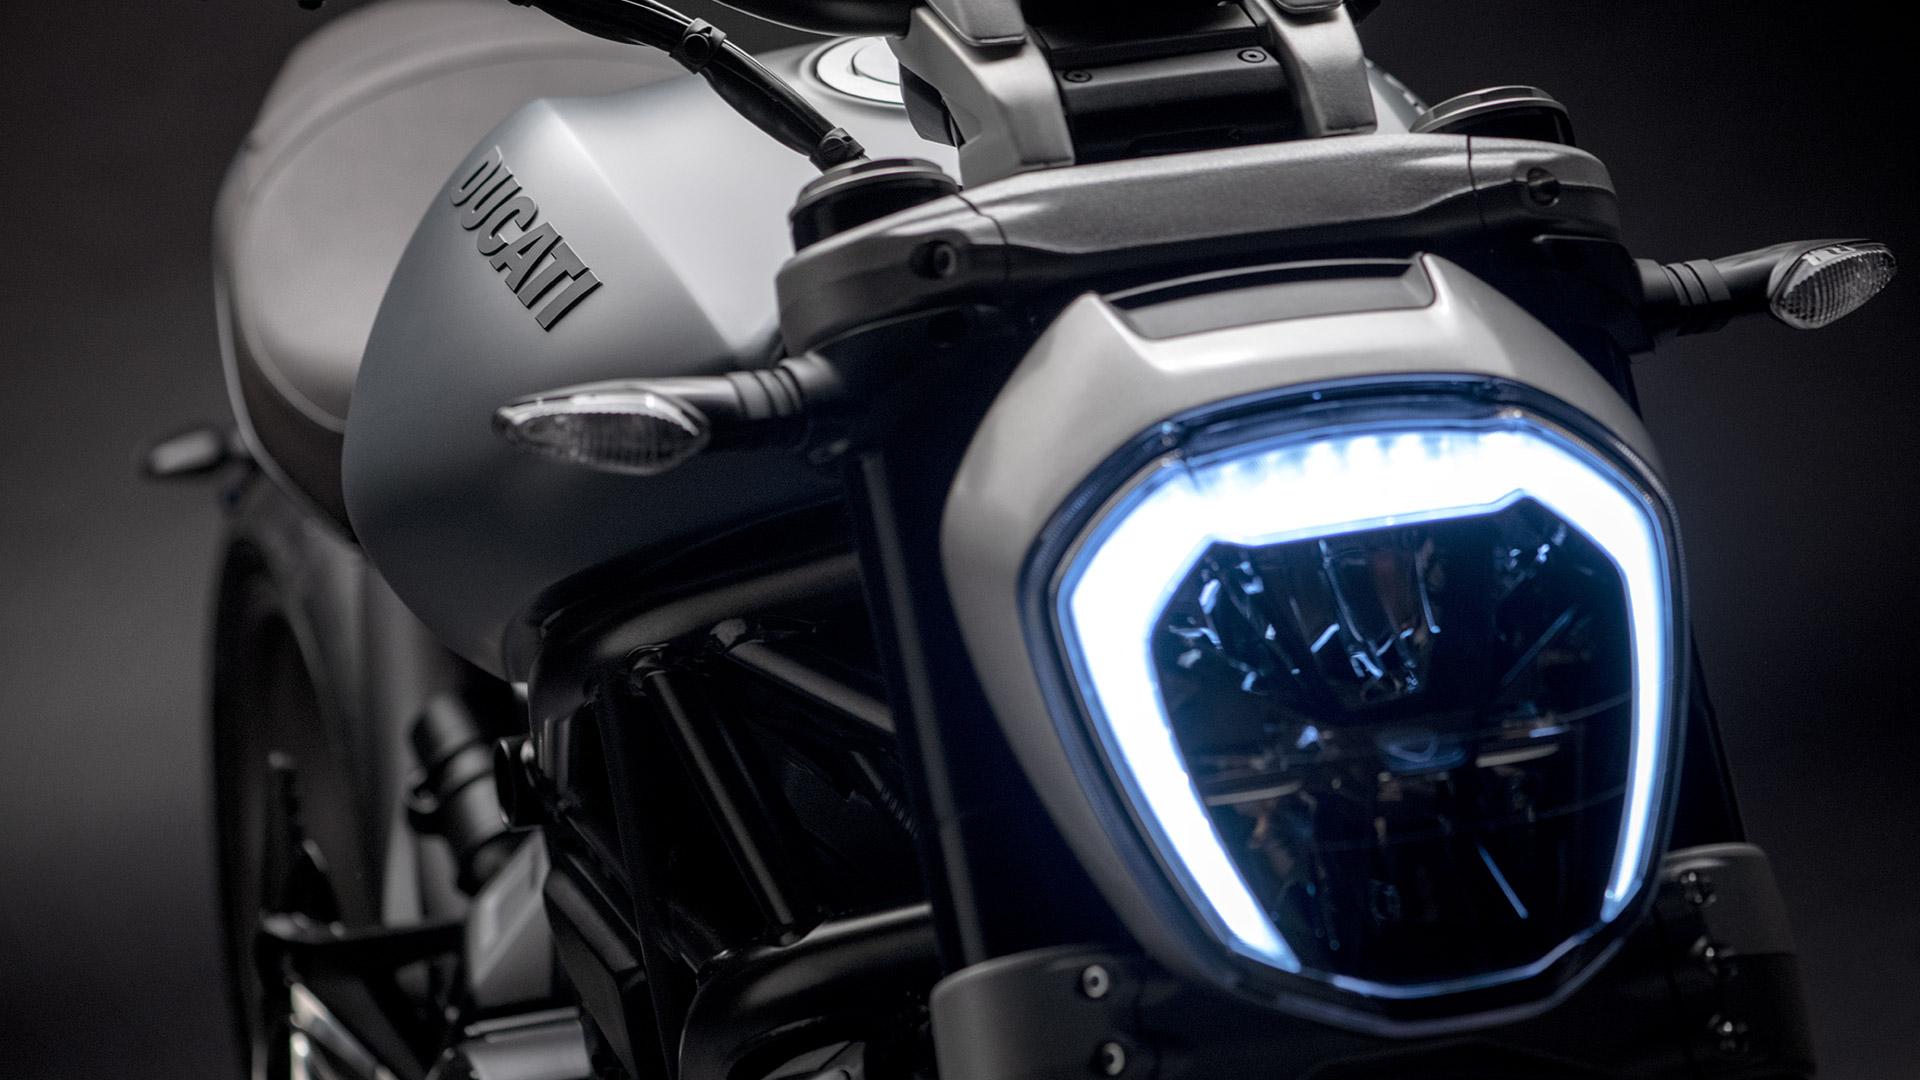 2020 Ducati XDiavel / XDiavel S